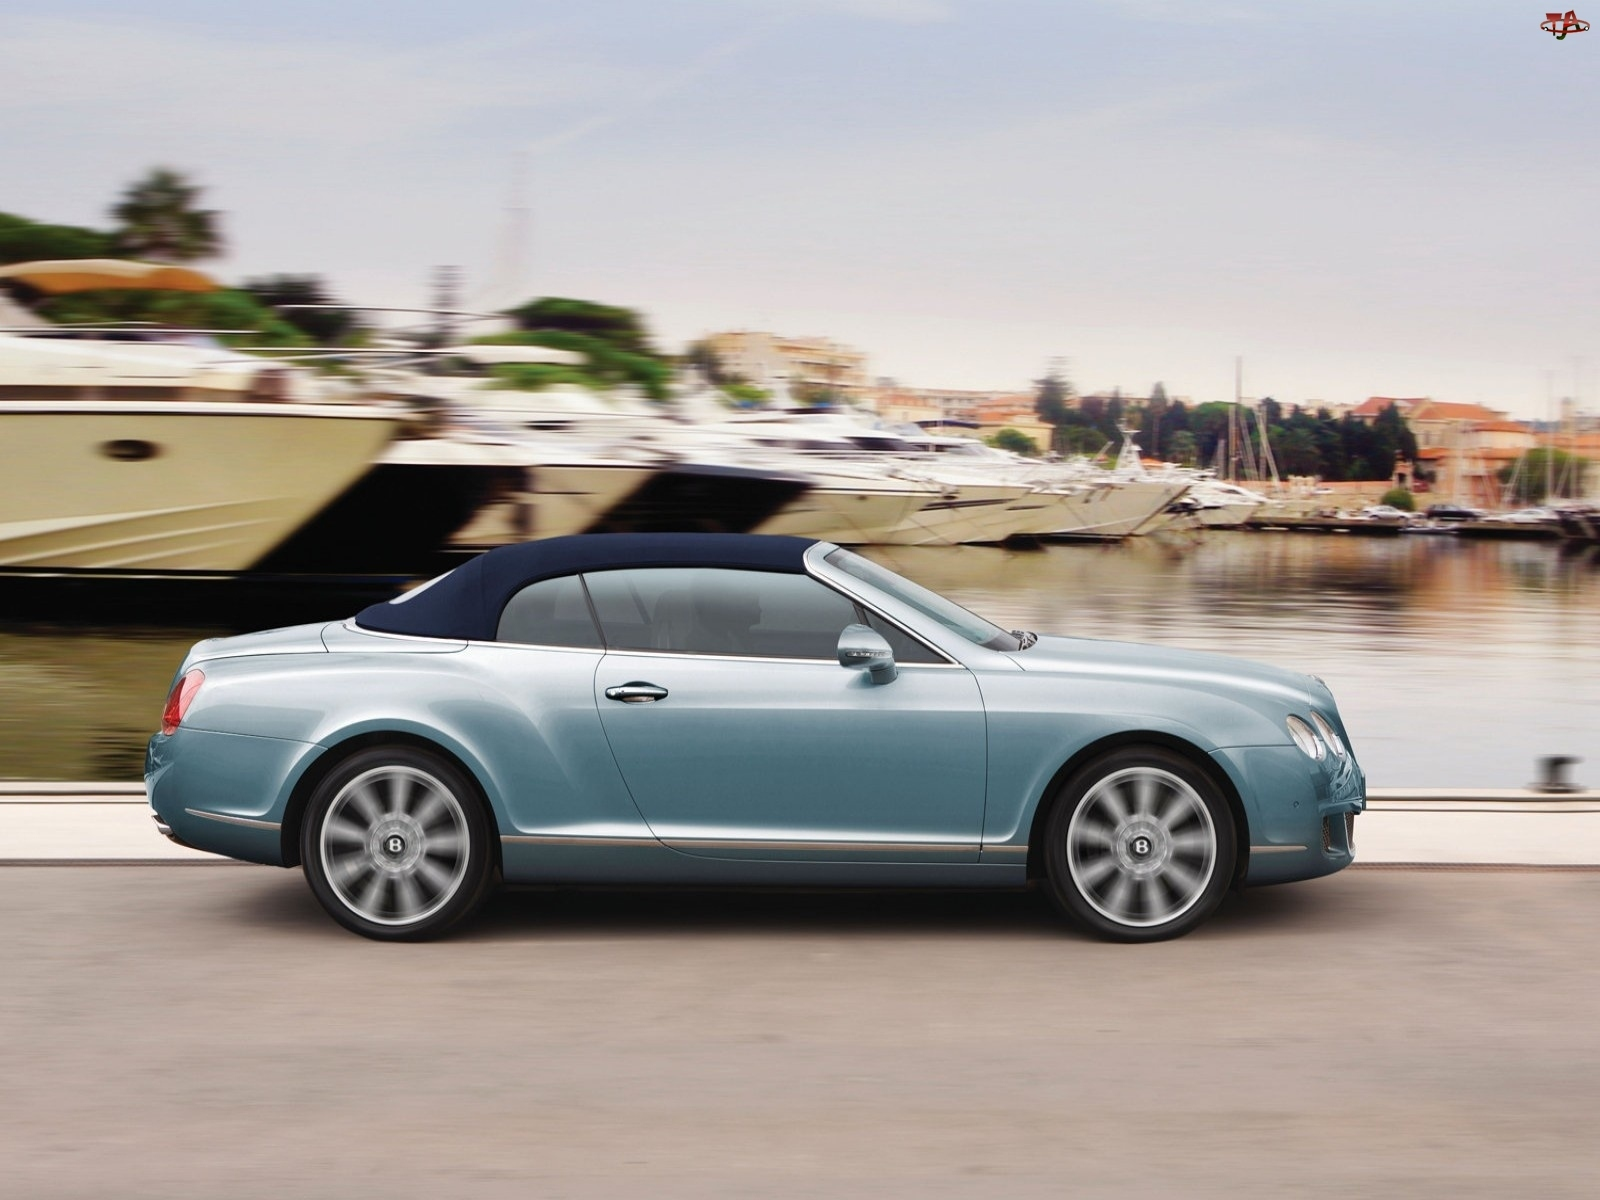 Dach, Bentley Continental GTC, Brezentowy